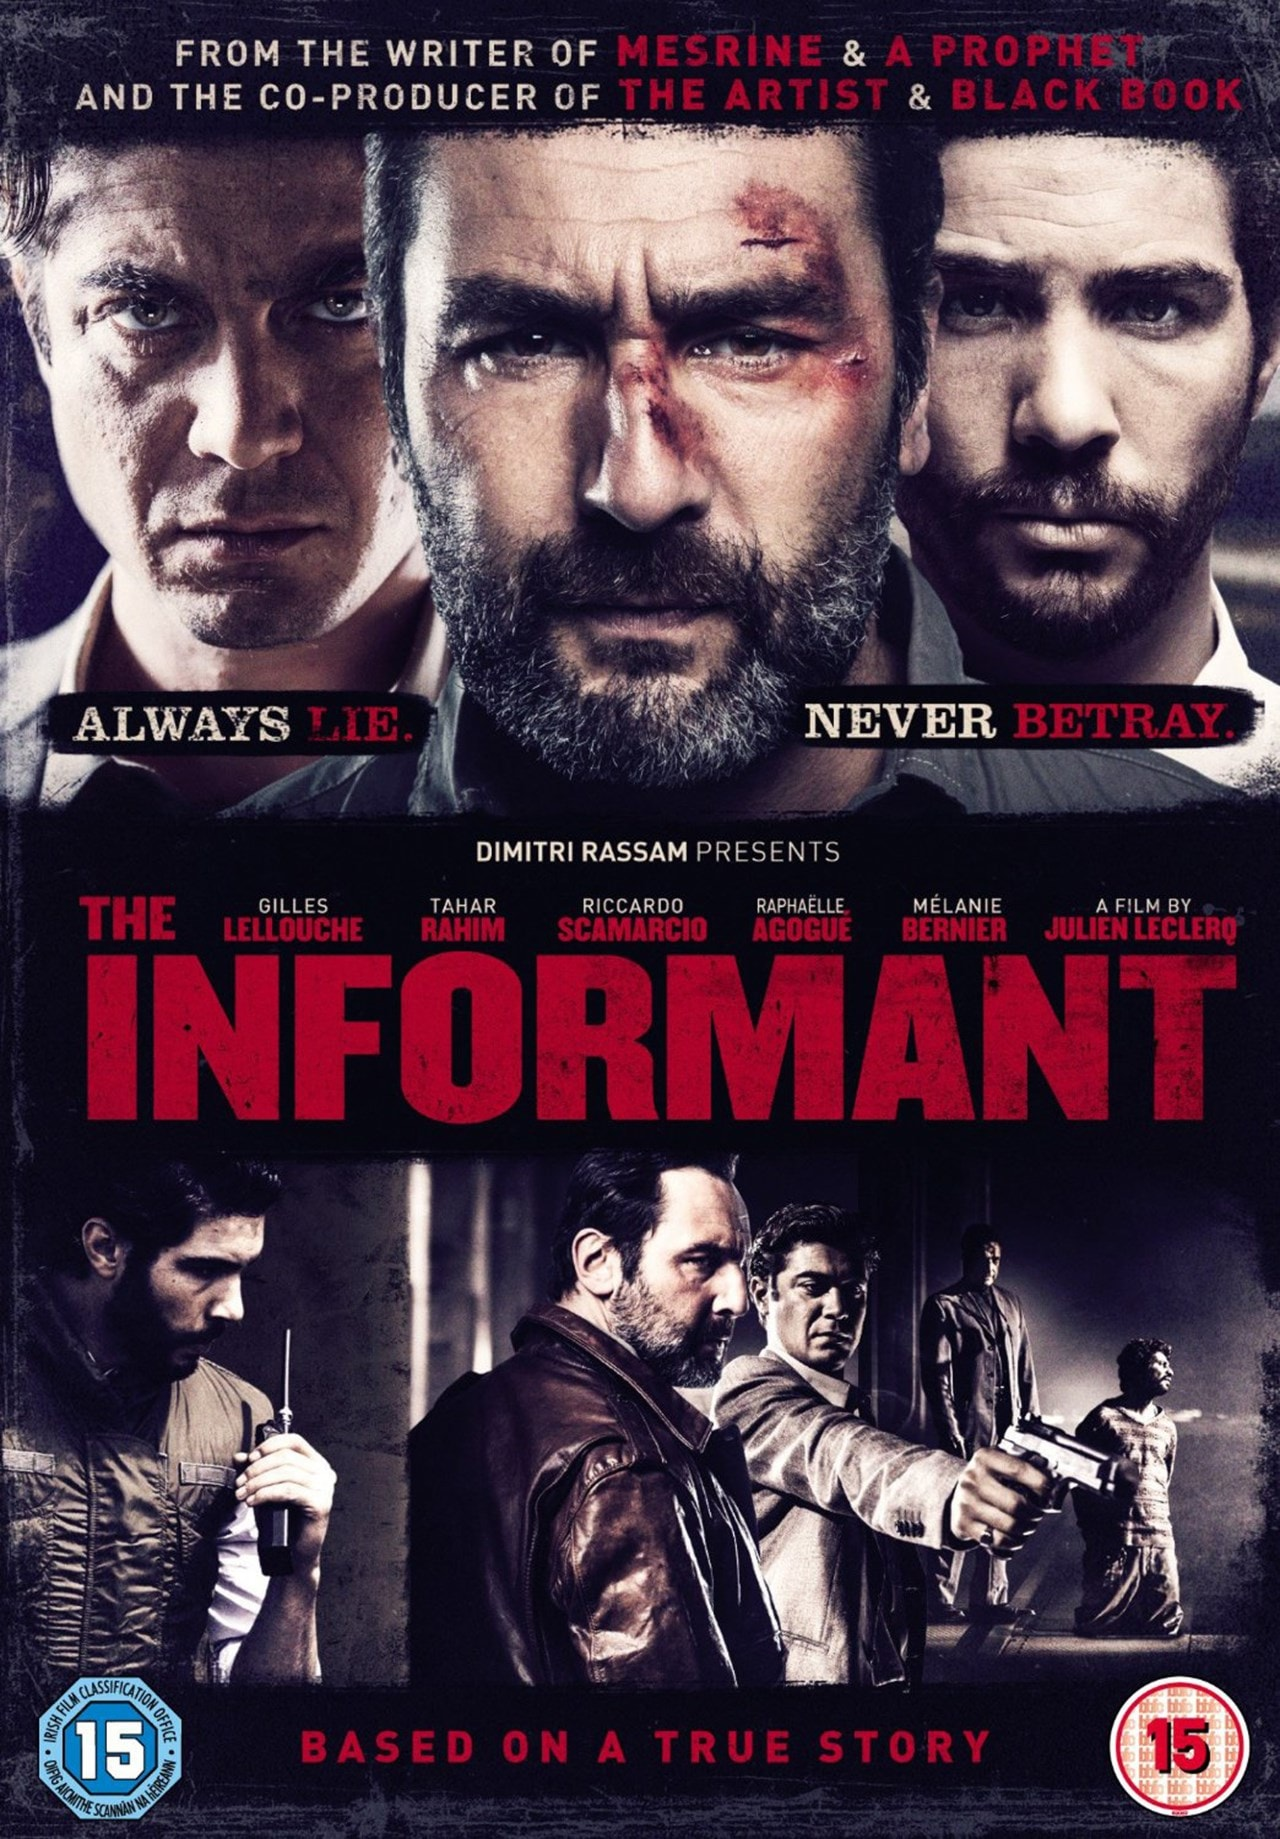 The Informant - 1